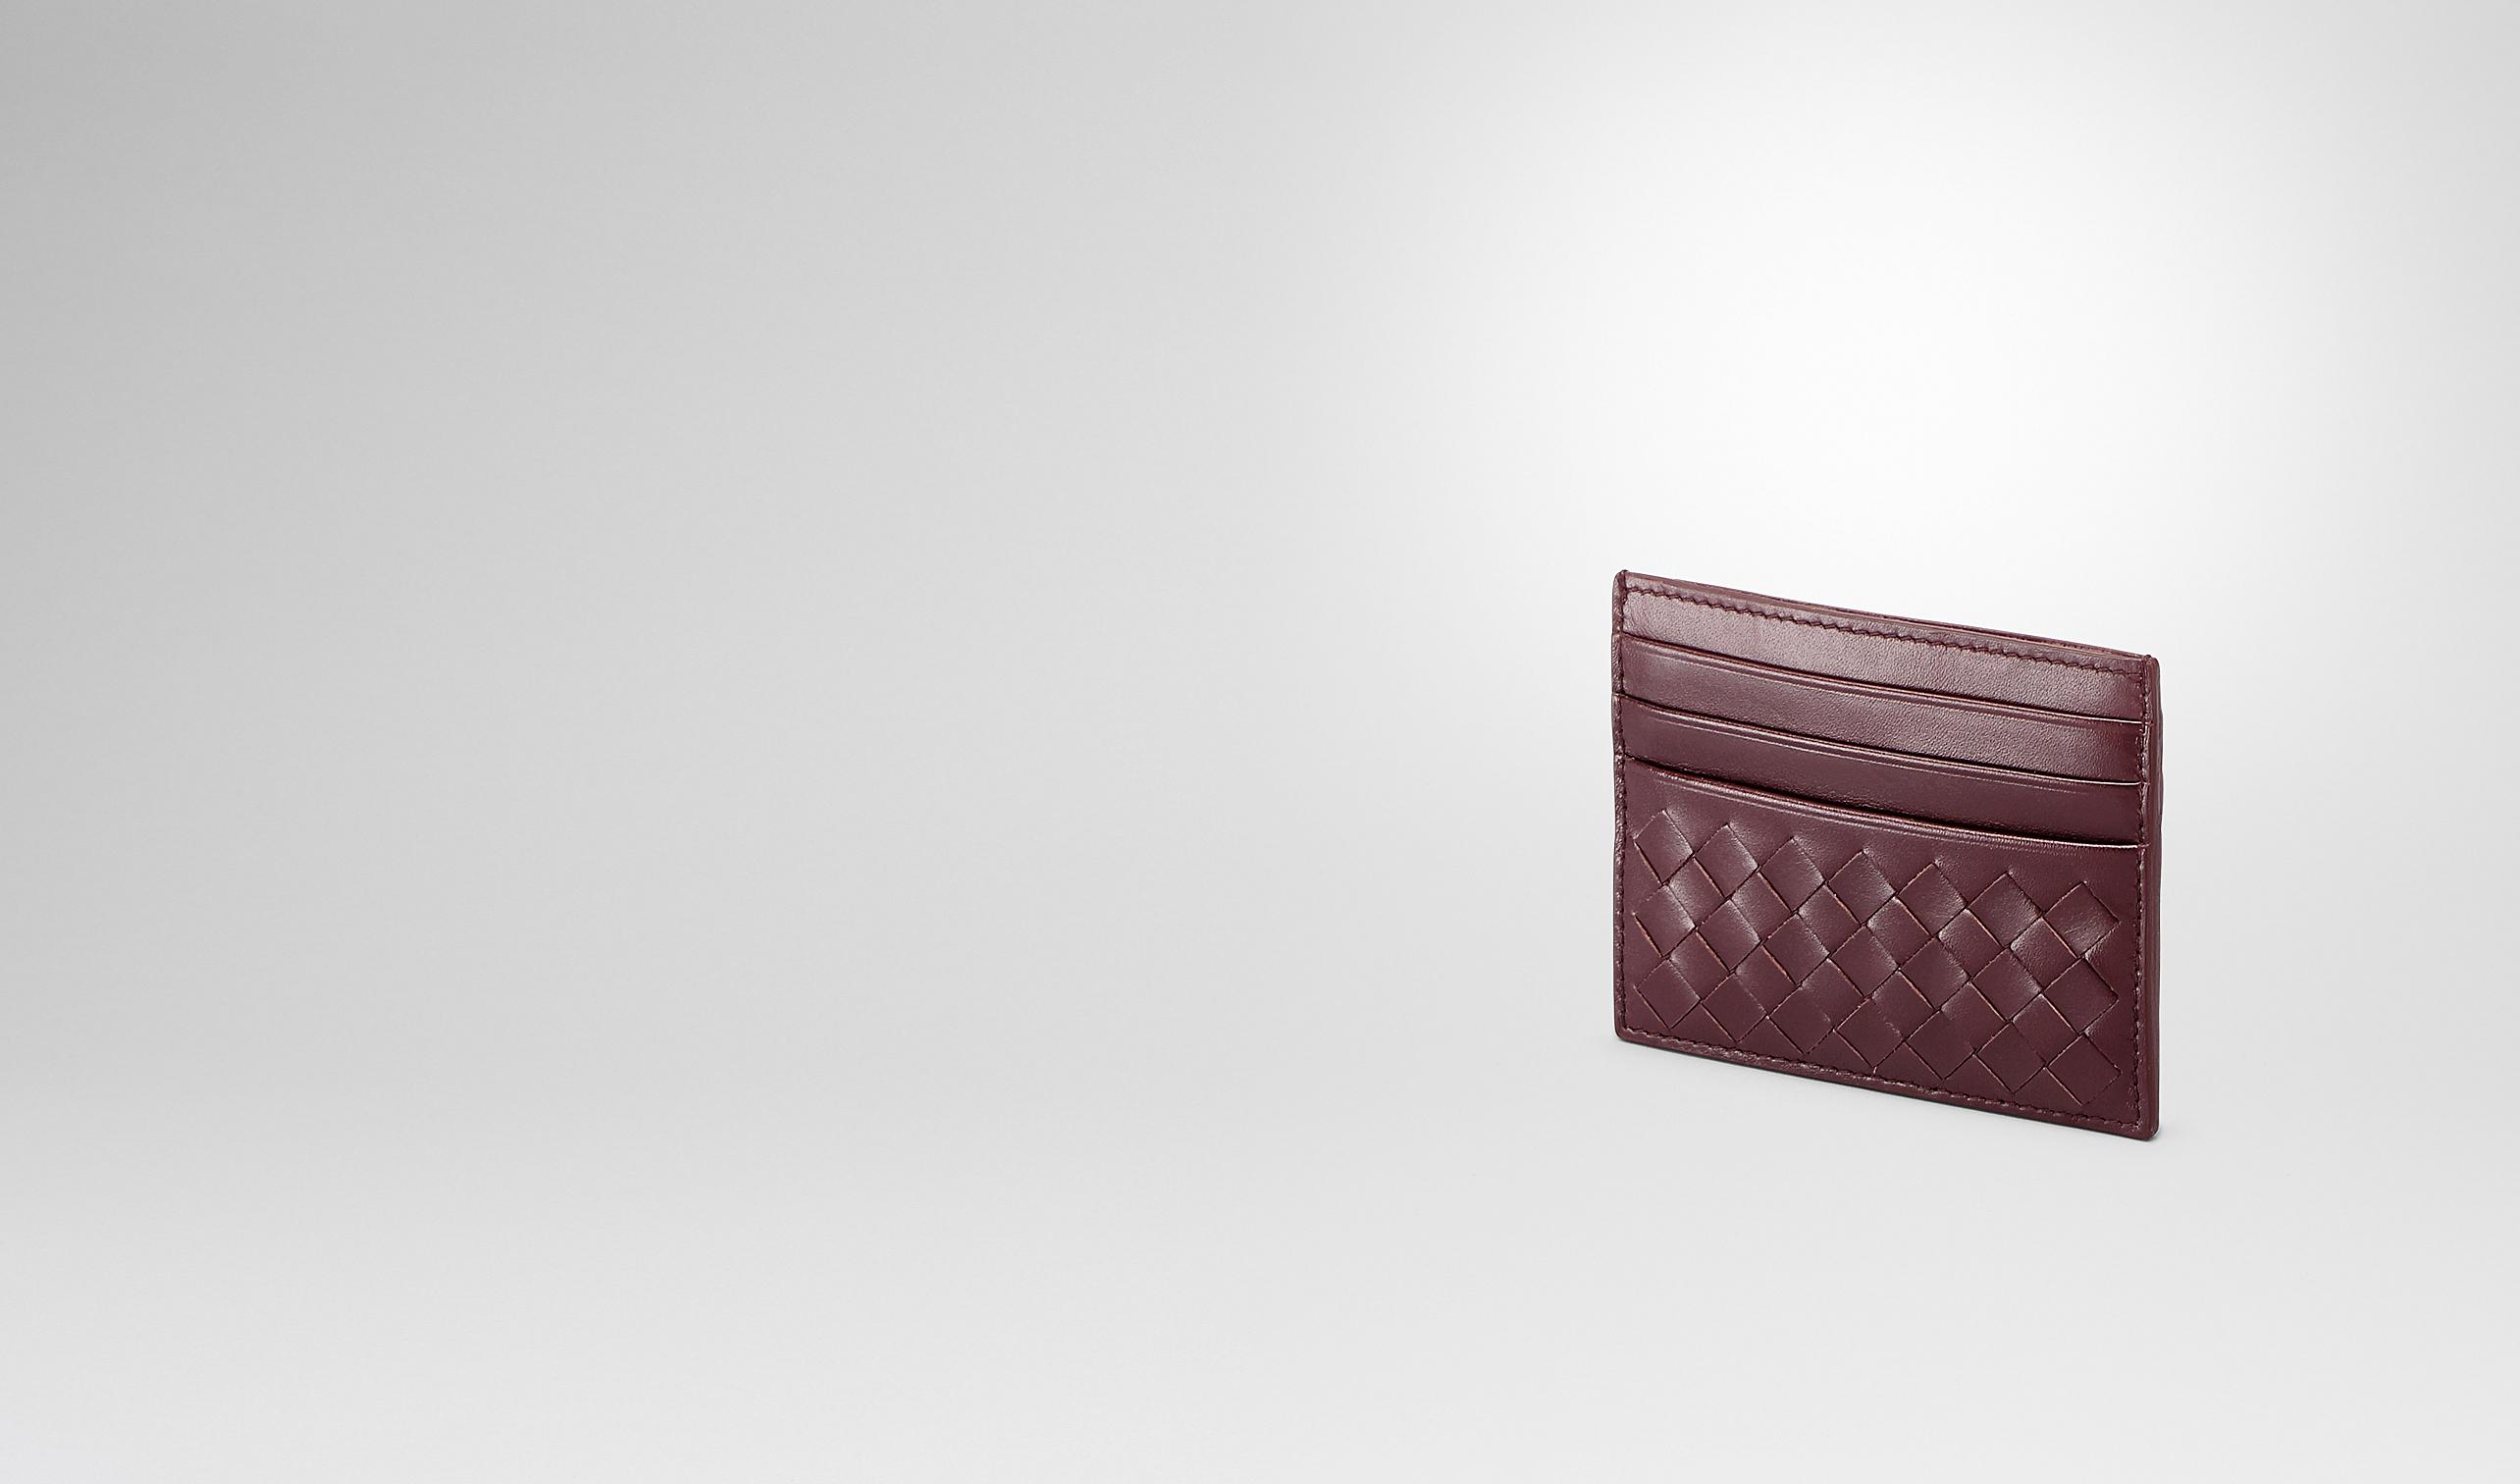 BOTTEGA VENETA Kartenetui & Geldbörse U KARTENETUI AUS VN-LEDER INTRECCIATO AUBERGINE pl